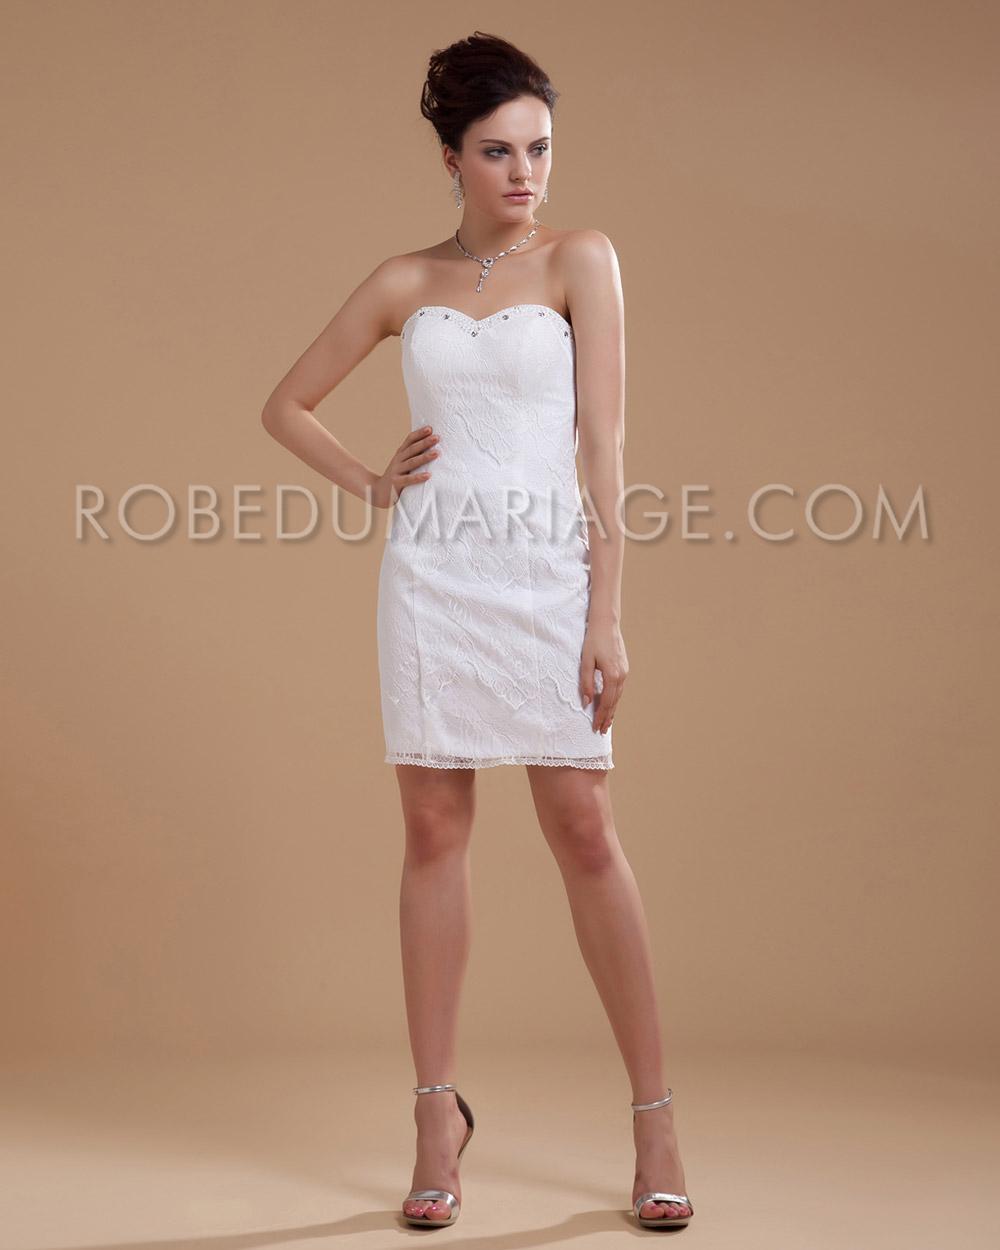 robe de mariage moulante en dentelle col en coeur courte robe206439. Black Bedroom Furniture Sets. Home Design Ideas